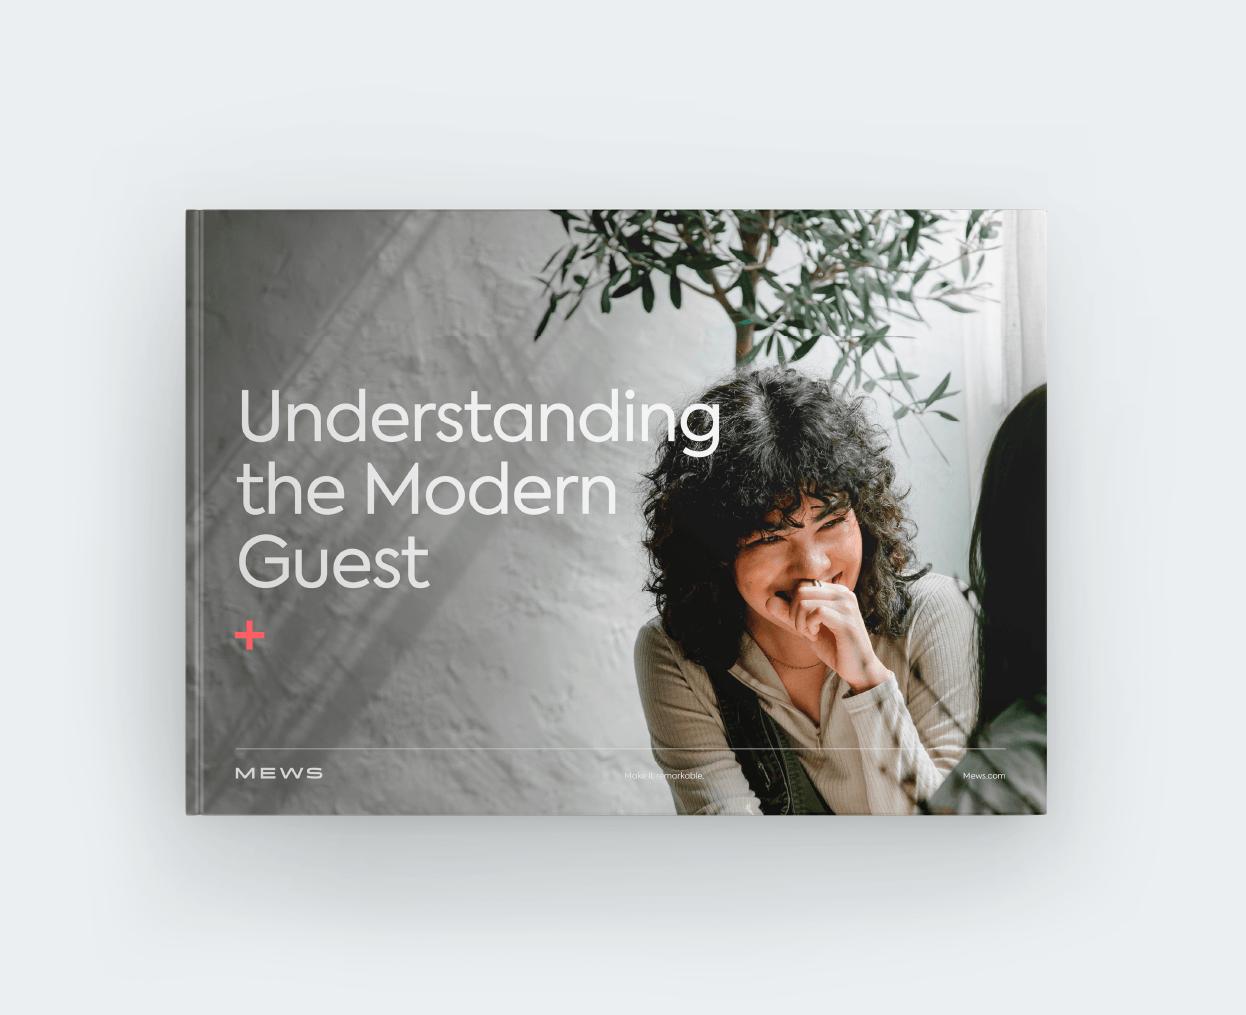 Understanding the modern gust_Hero - 1245x1014-1